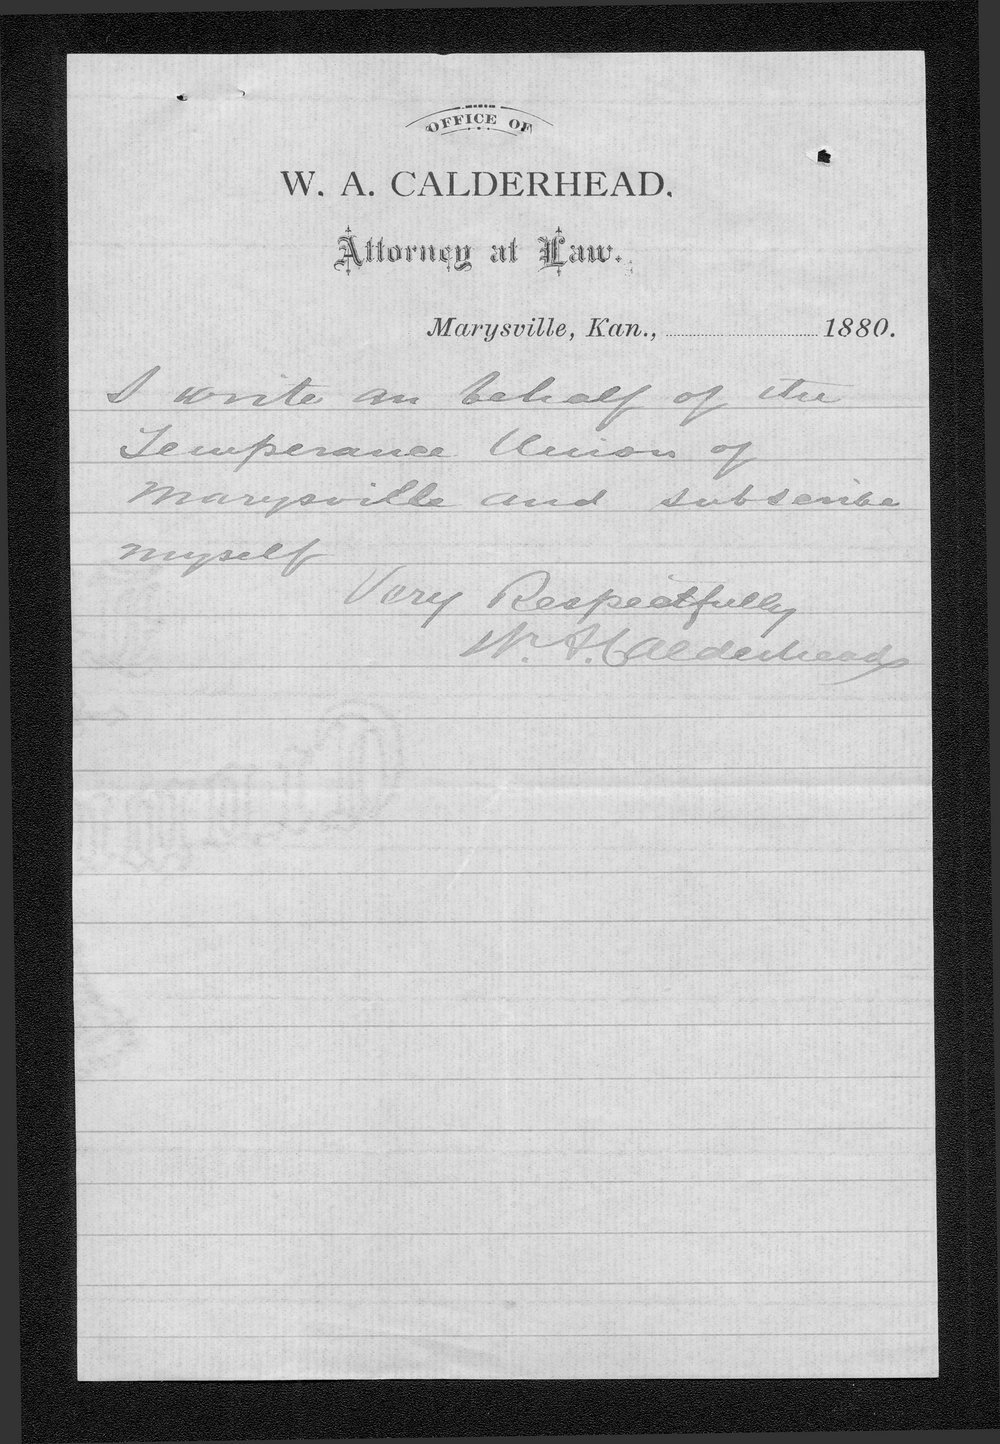 W. A. Calderhead to Governor John St. John - 3